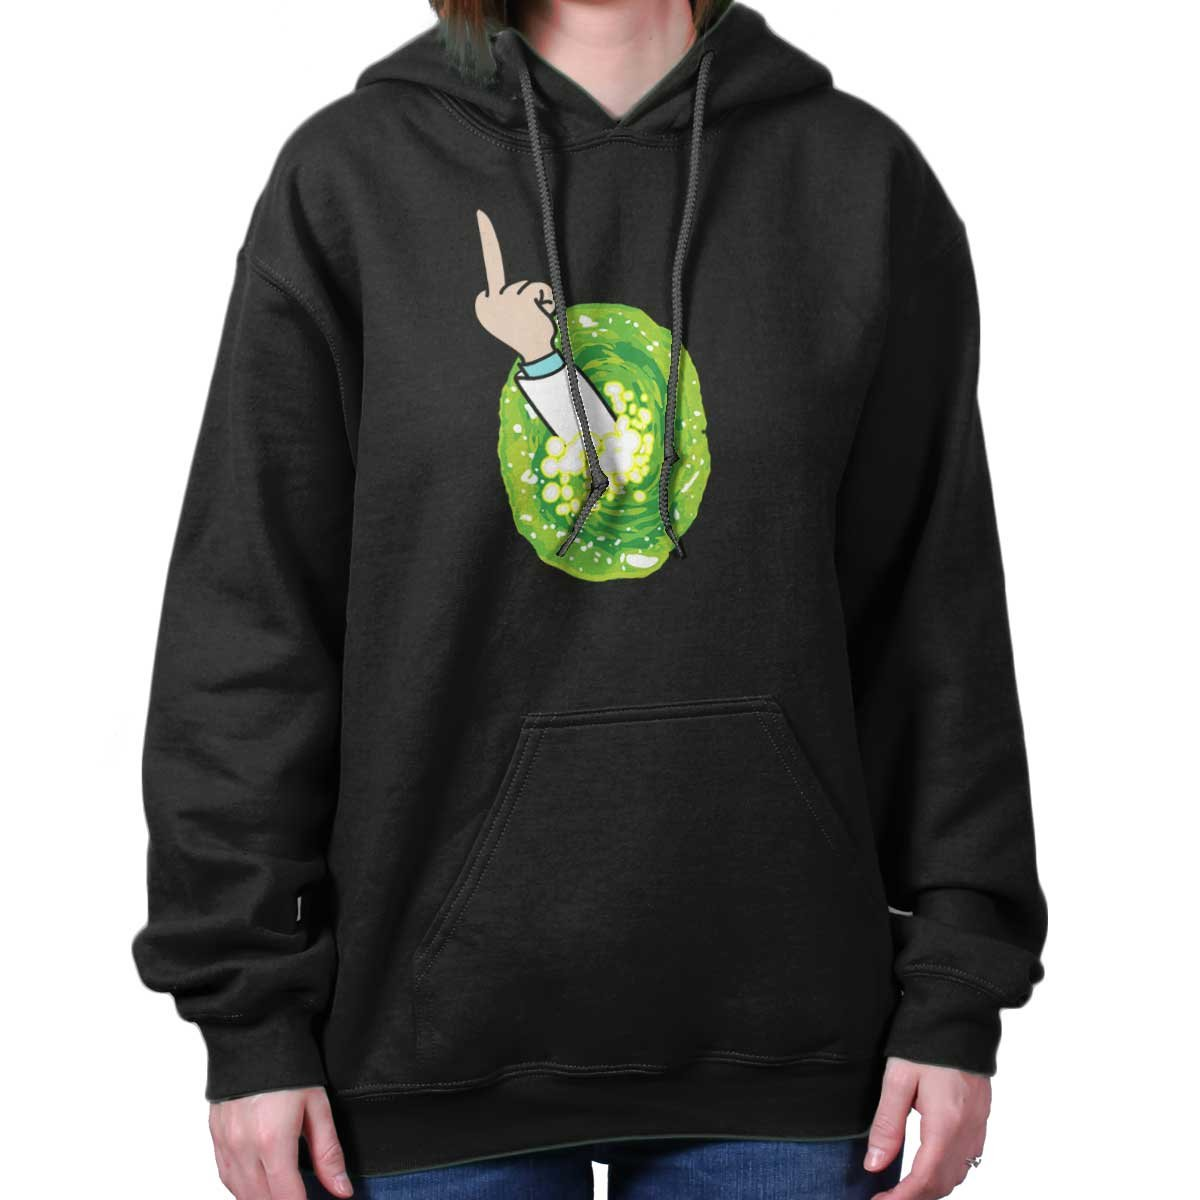 Brisco Brands Portal Rick Sanchez Schwifty Cool Funny Morty GLIP Glop Edgy Hoodie Sweatshirt by Brisco Brands (Image #4)